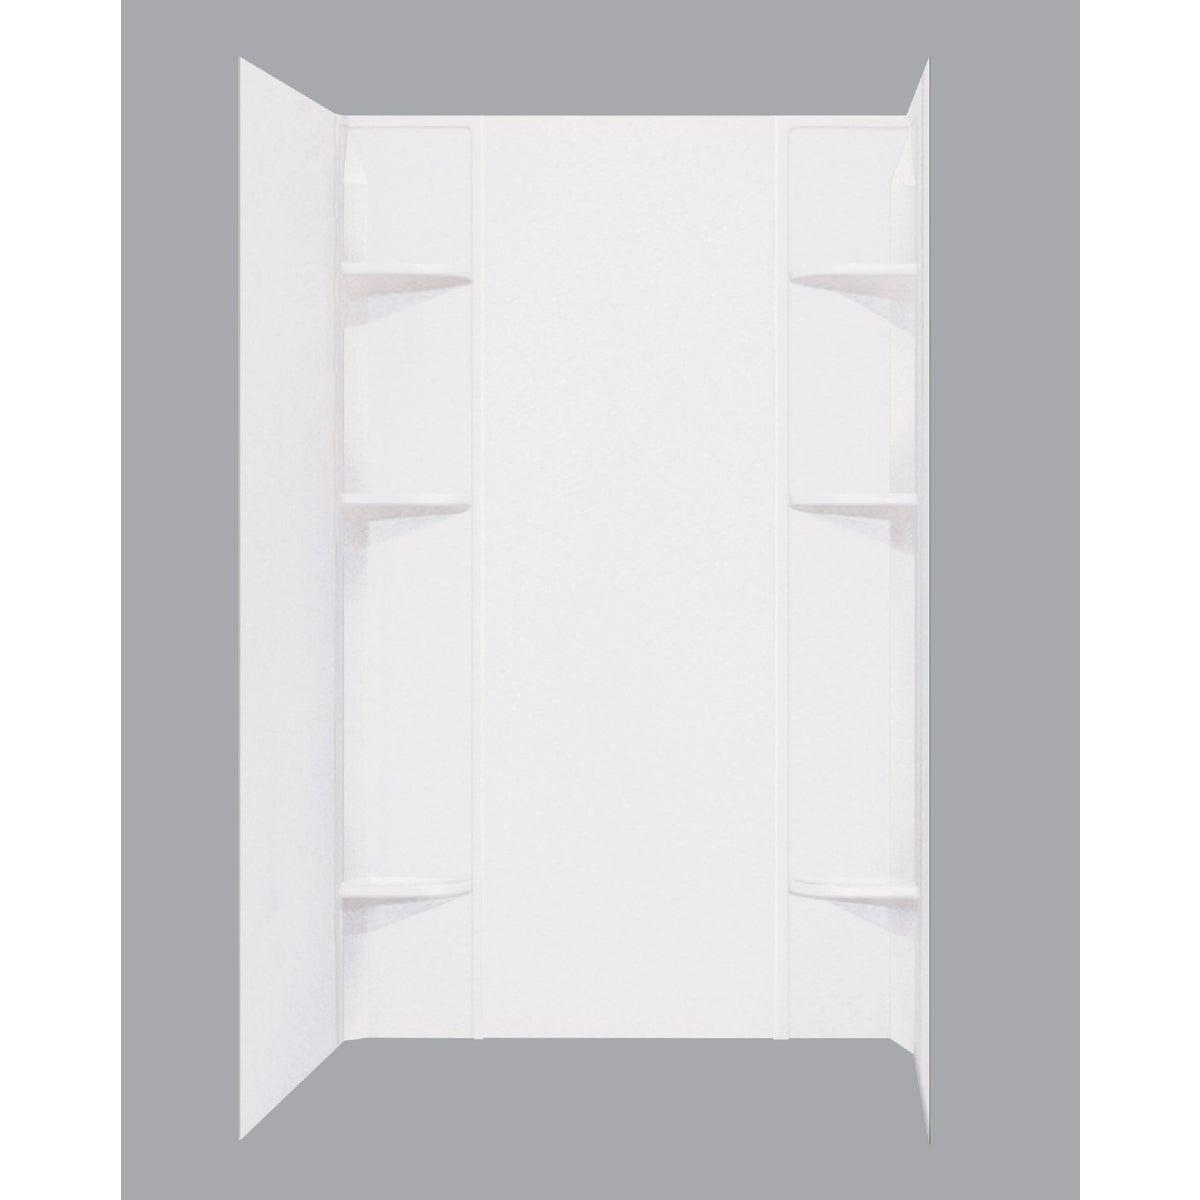 WHITE SHOWER WALL SET